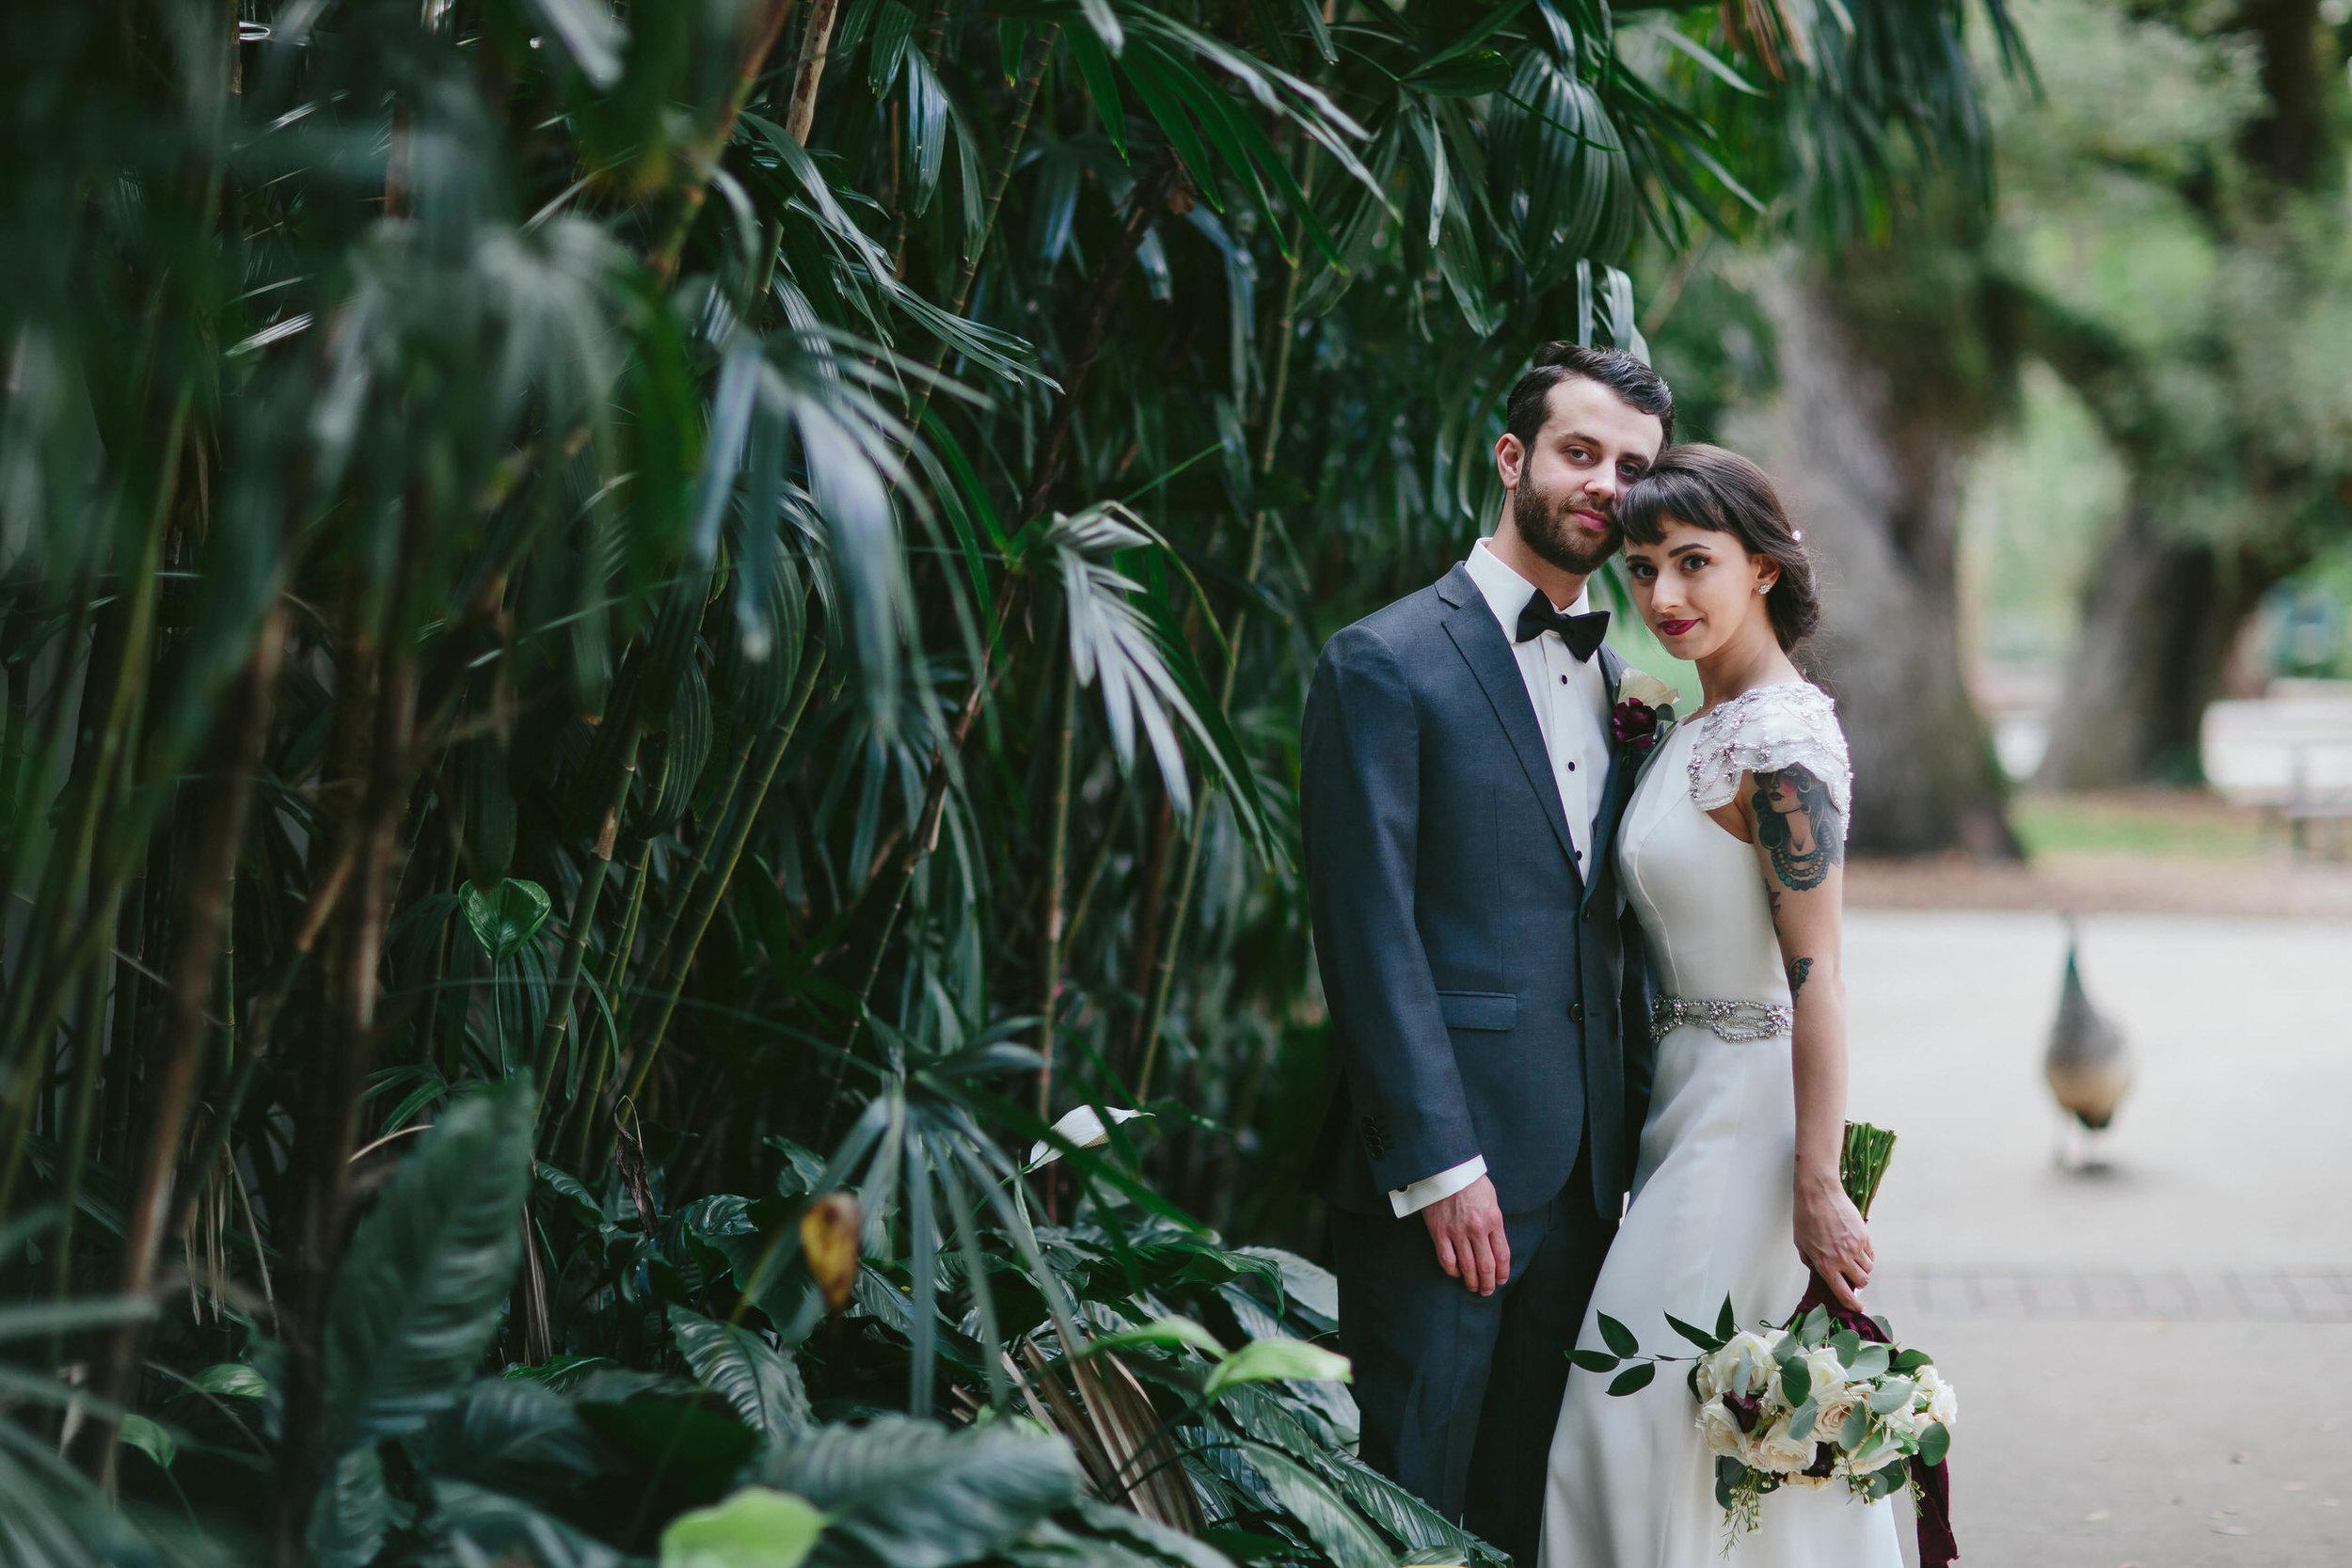 tiny-house-photo-documentary-wedding-photography-destination-travel-weddings-tiny-house-photo.jpg